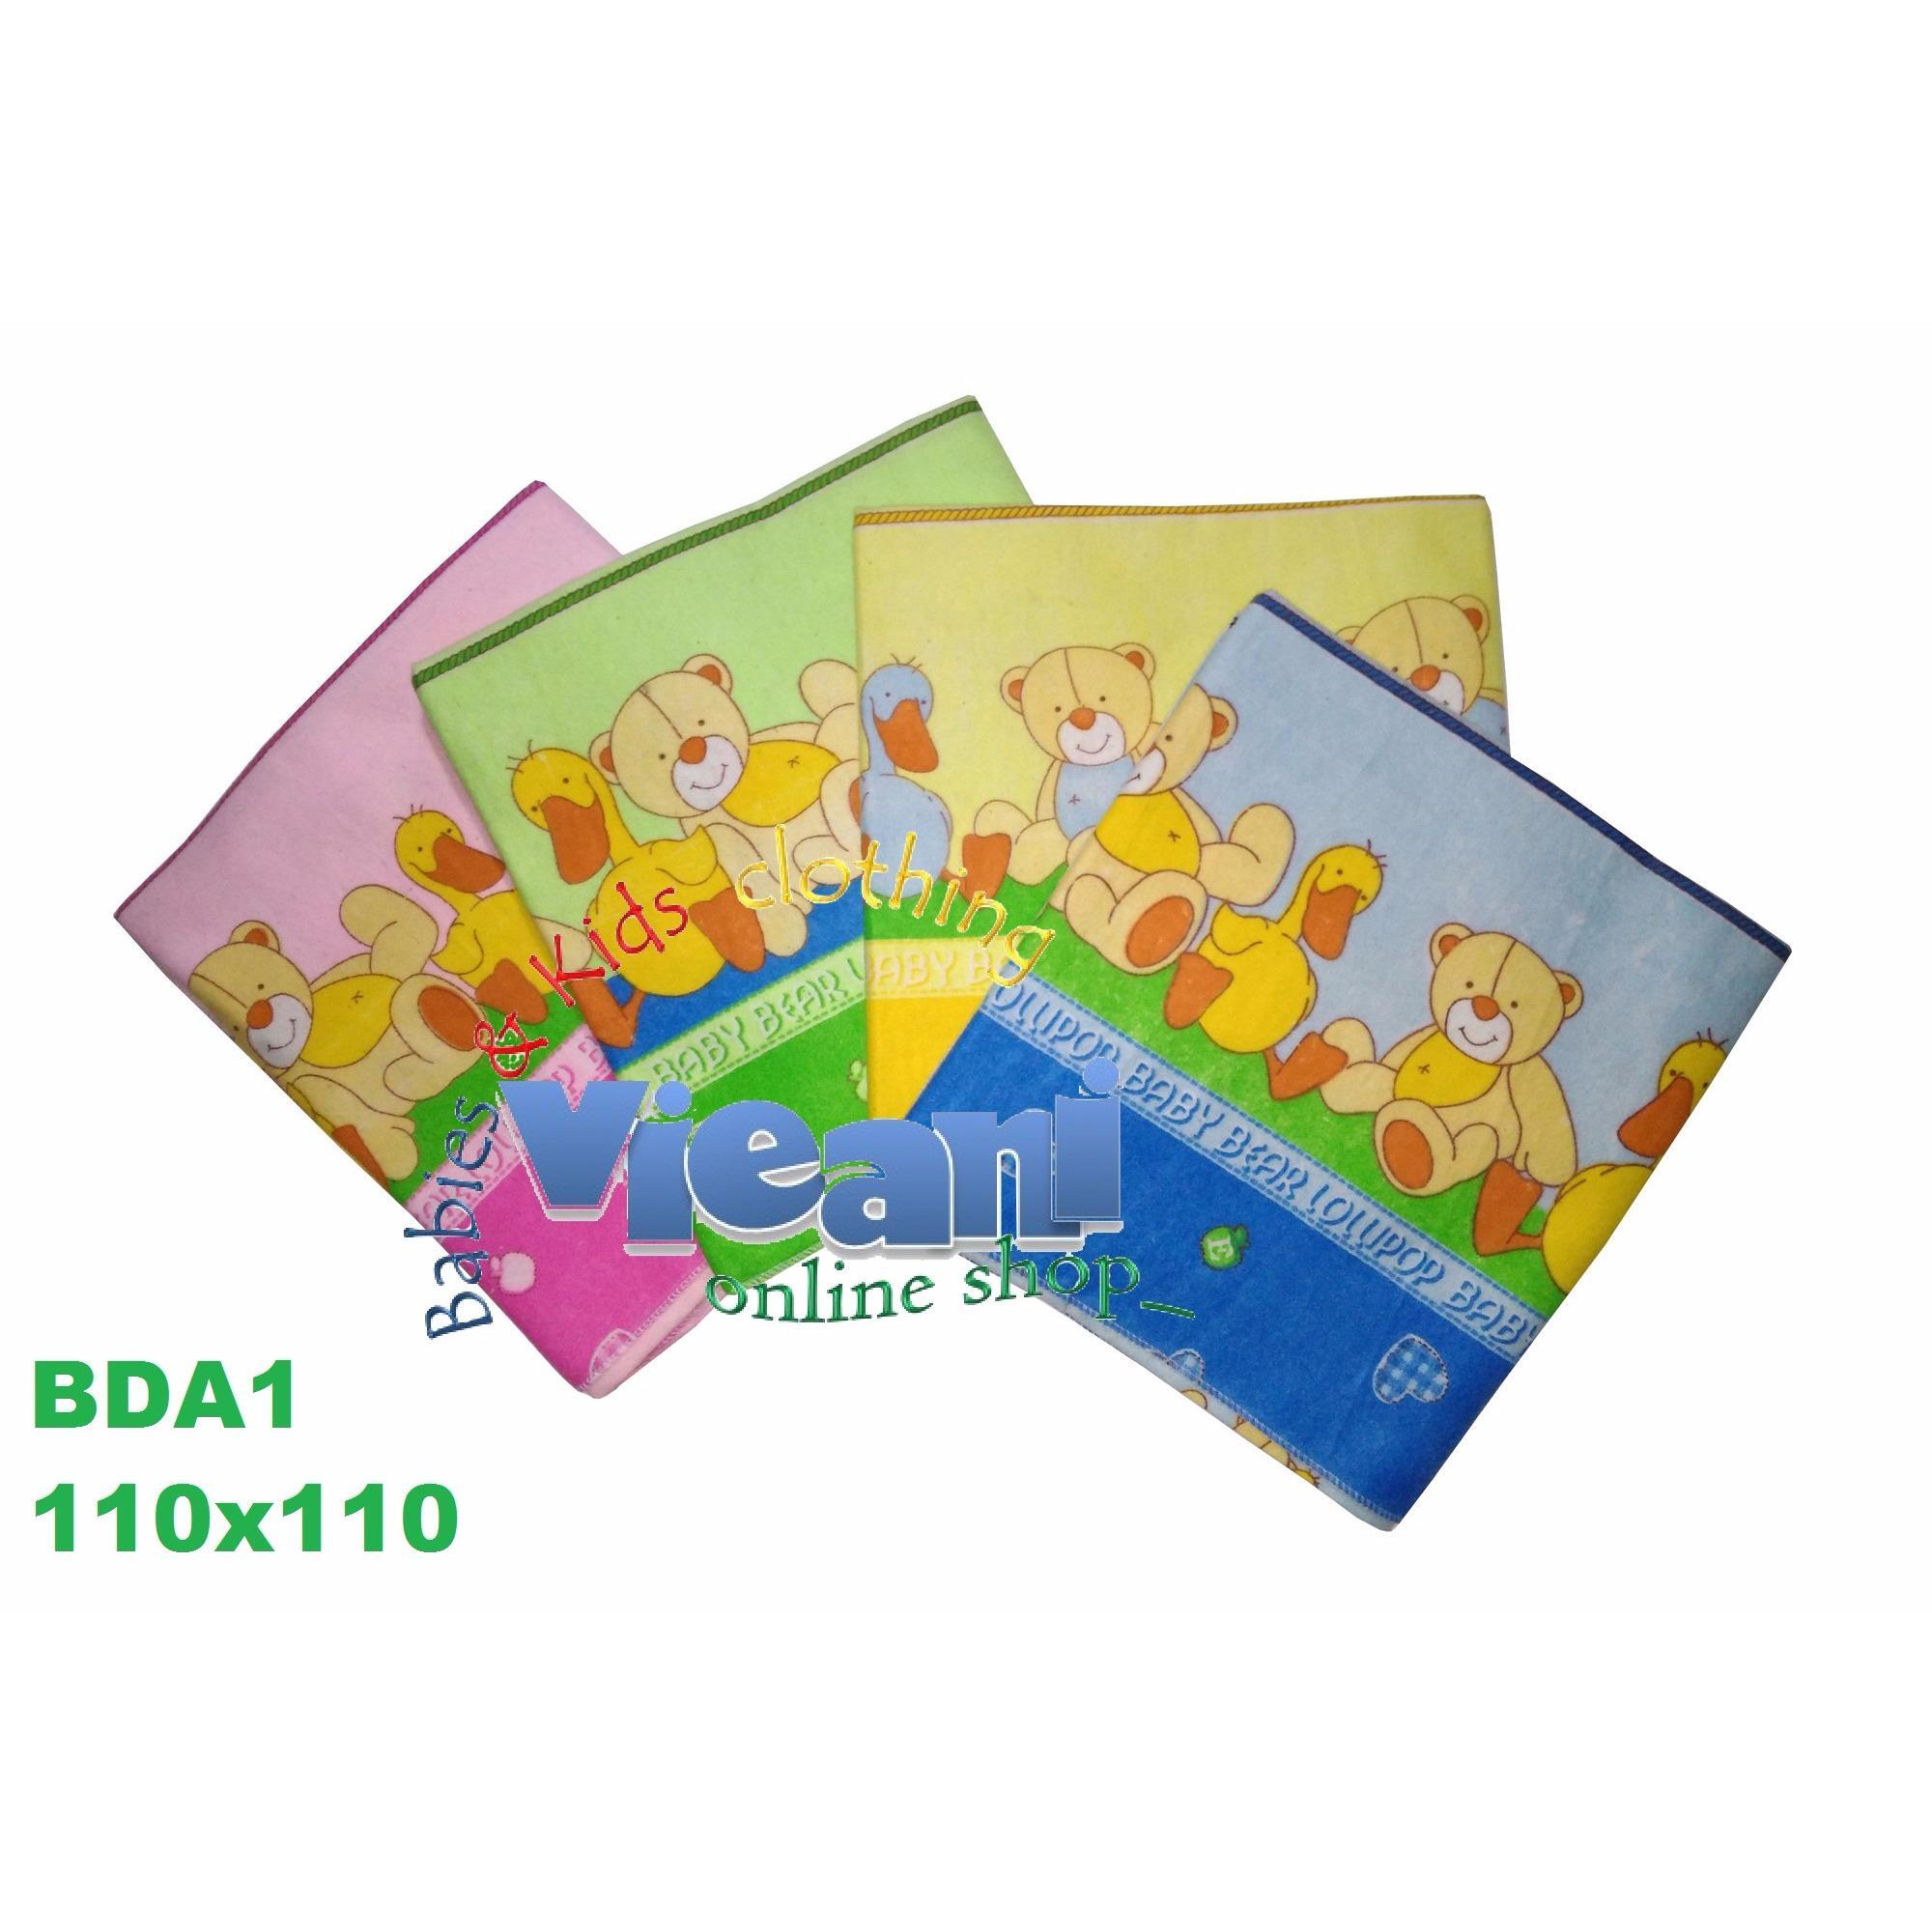 Baby Bedong Bayi Kaos Isi 4 Pcs Selimut Alas Warna Bahan Fluffy 2pcs Bdg Putih Polos Newborn List Girl Harga Terendah 110x110 Discount Source